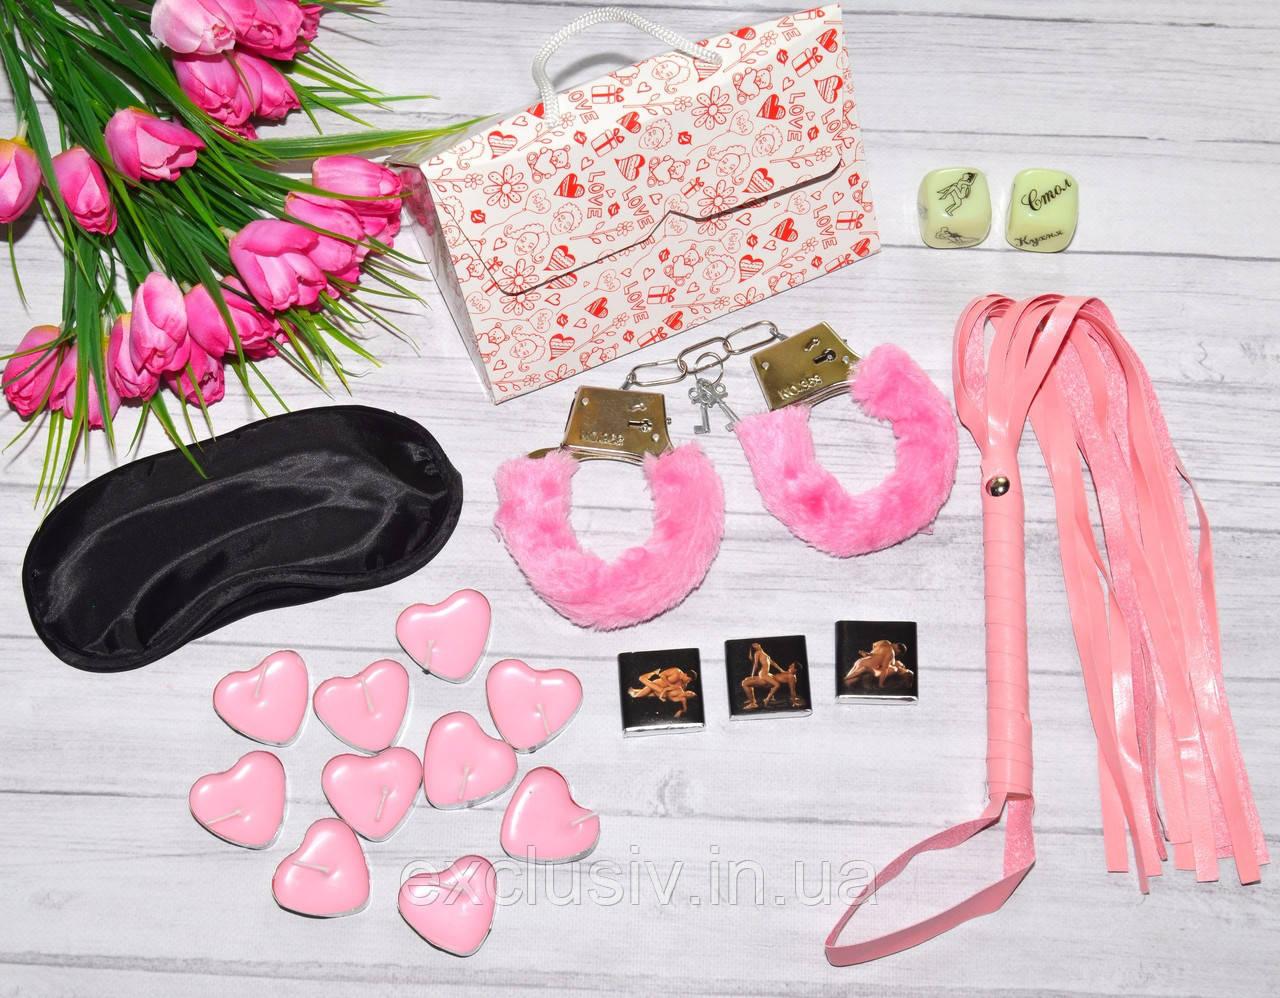 Секс набор для утех розовый, фото 1